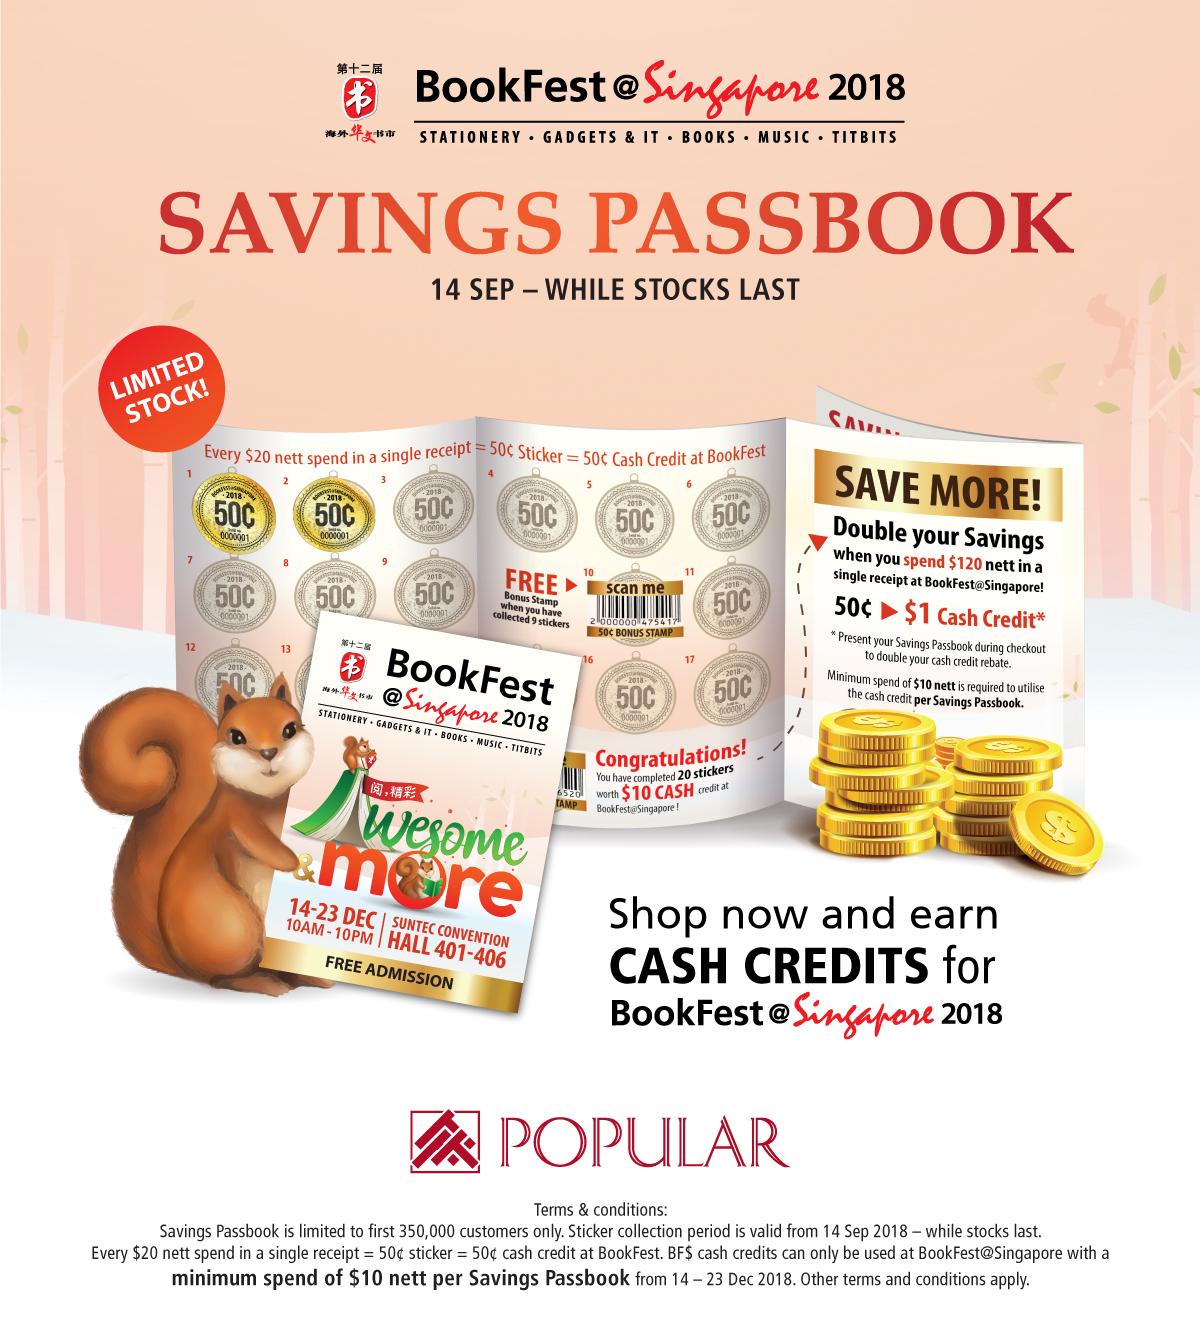 BookFest@ Singapore 2018 - Savings Passbook